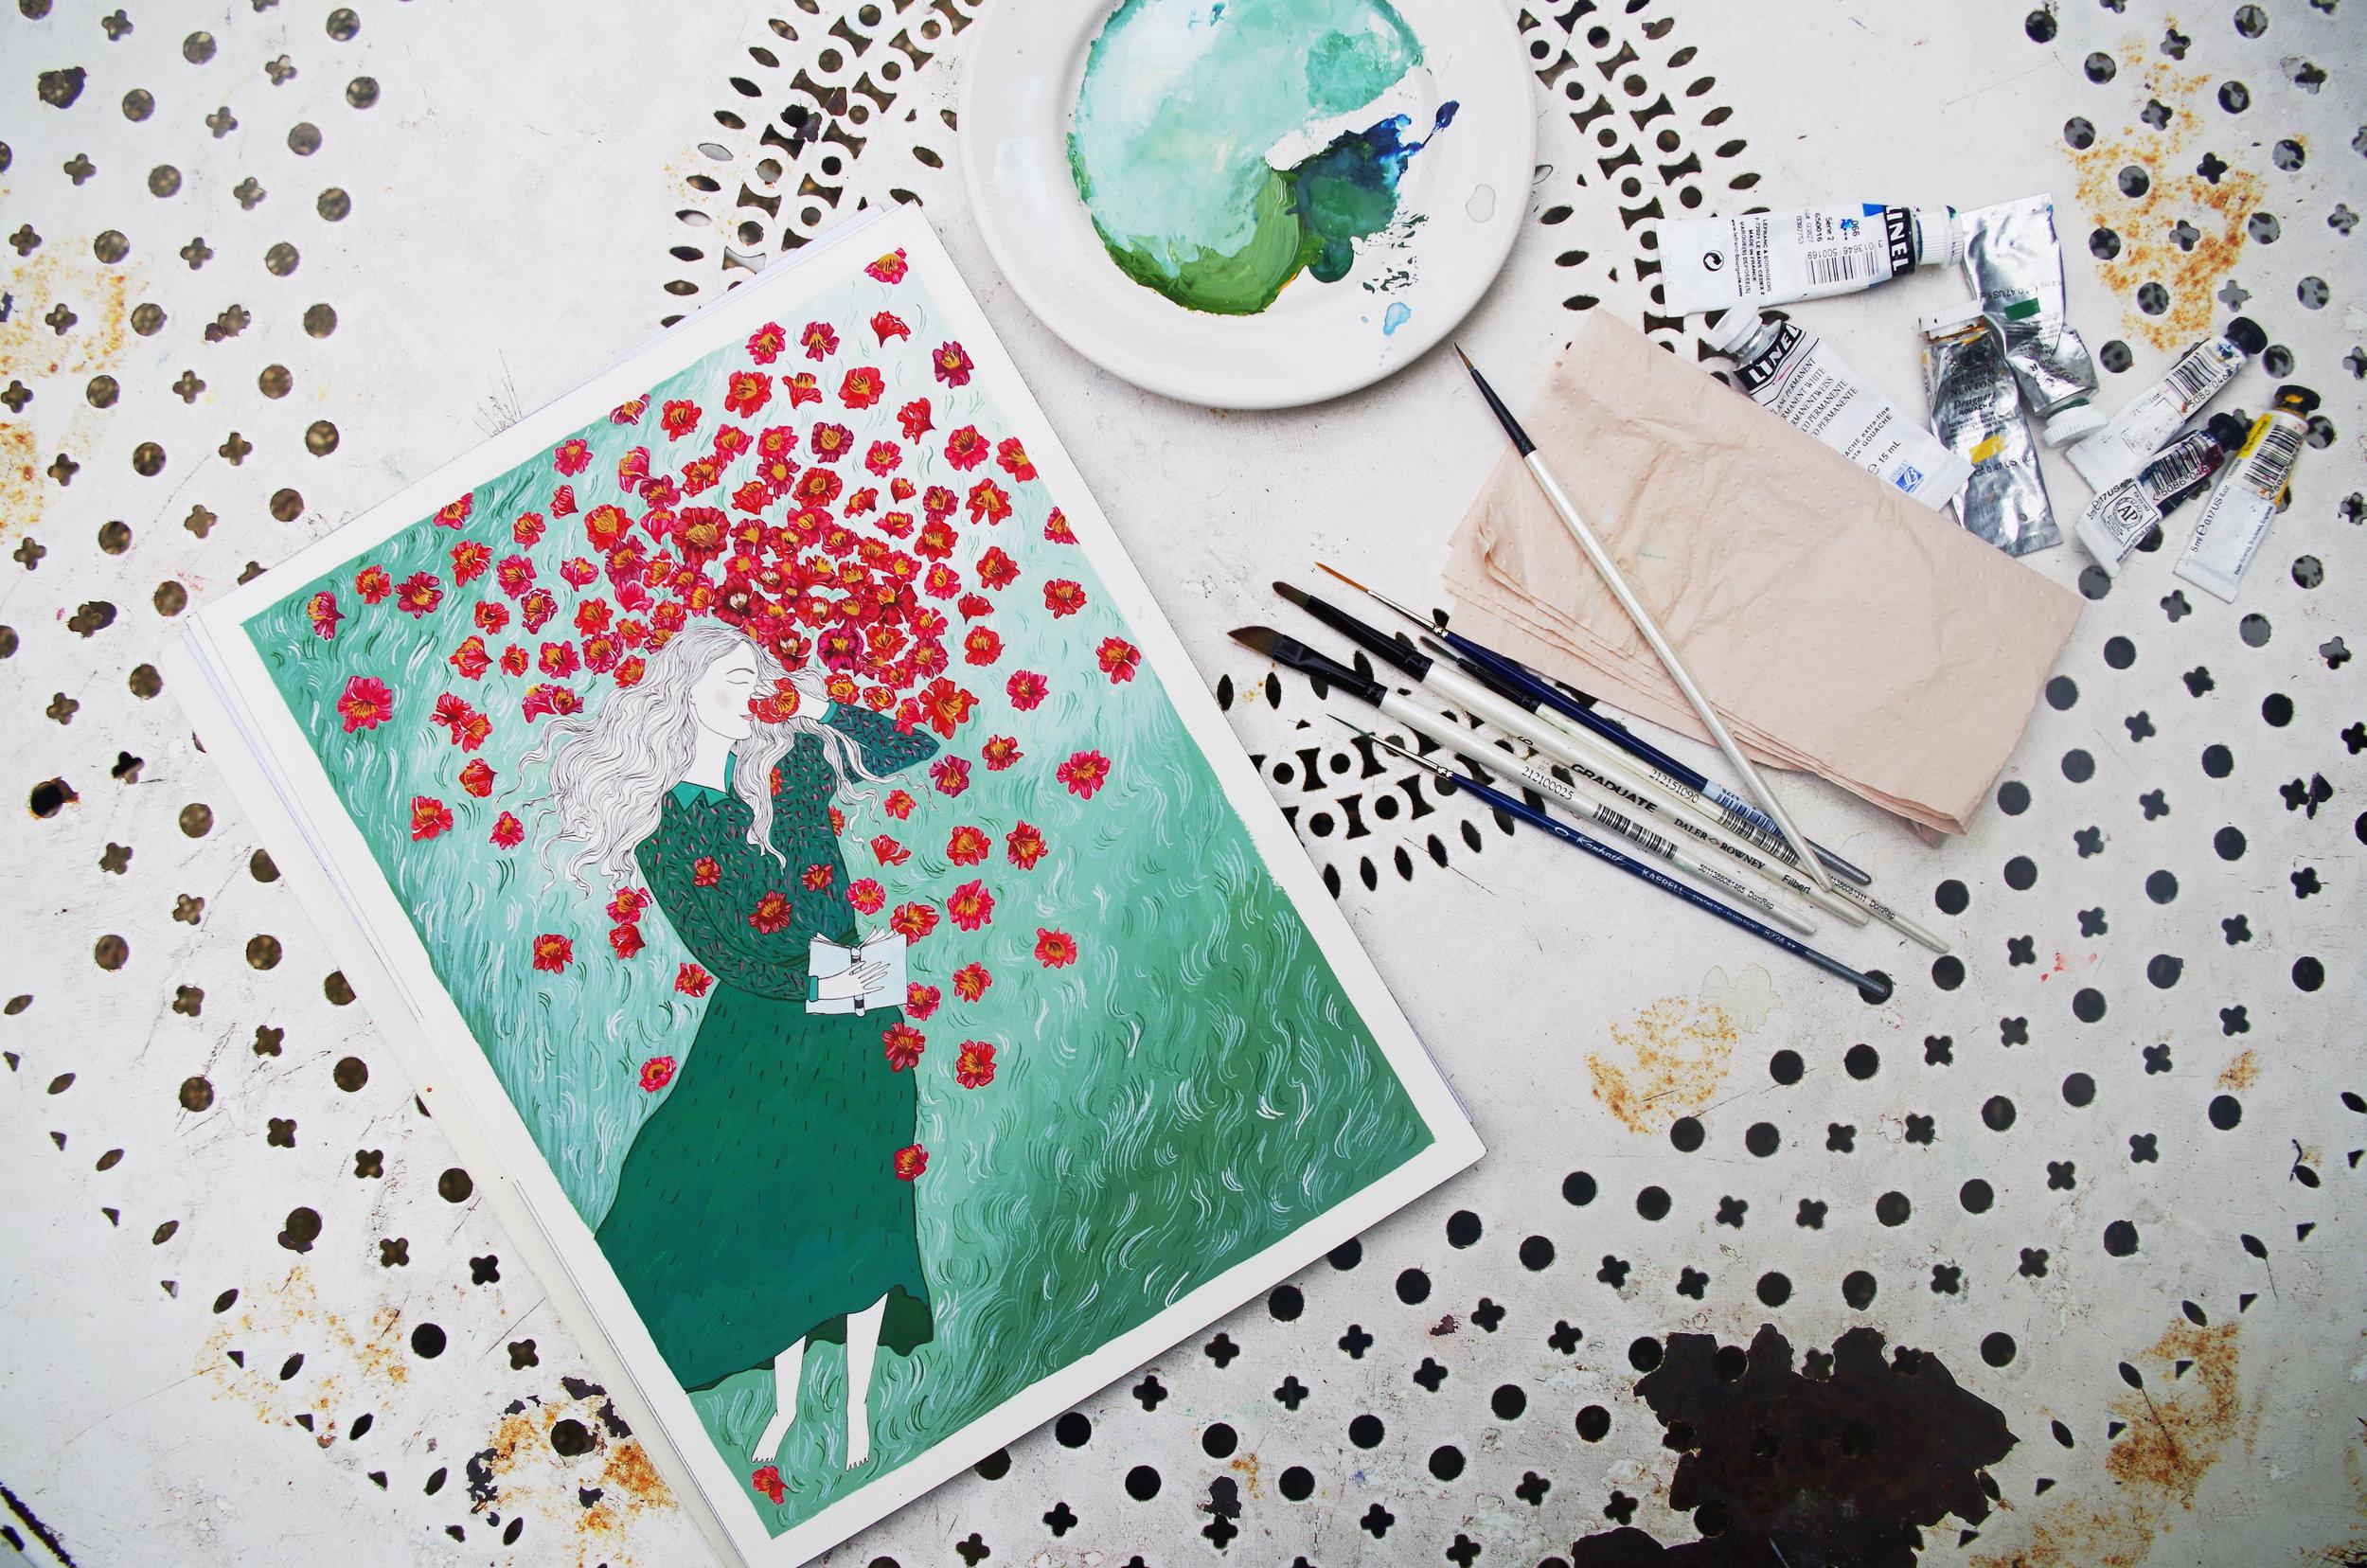 7All_is_grace_illustration_Janina_Bourosu.jpg.jpg